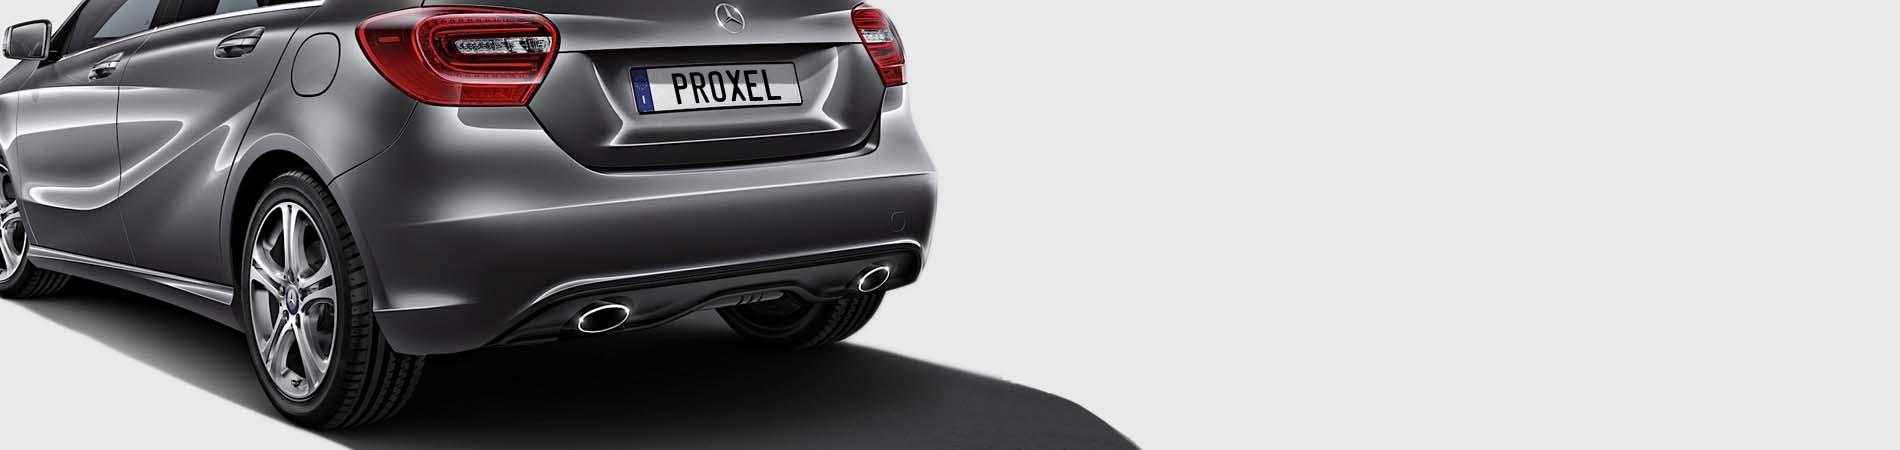 parking-sensors-proxel-eps-home